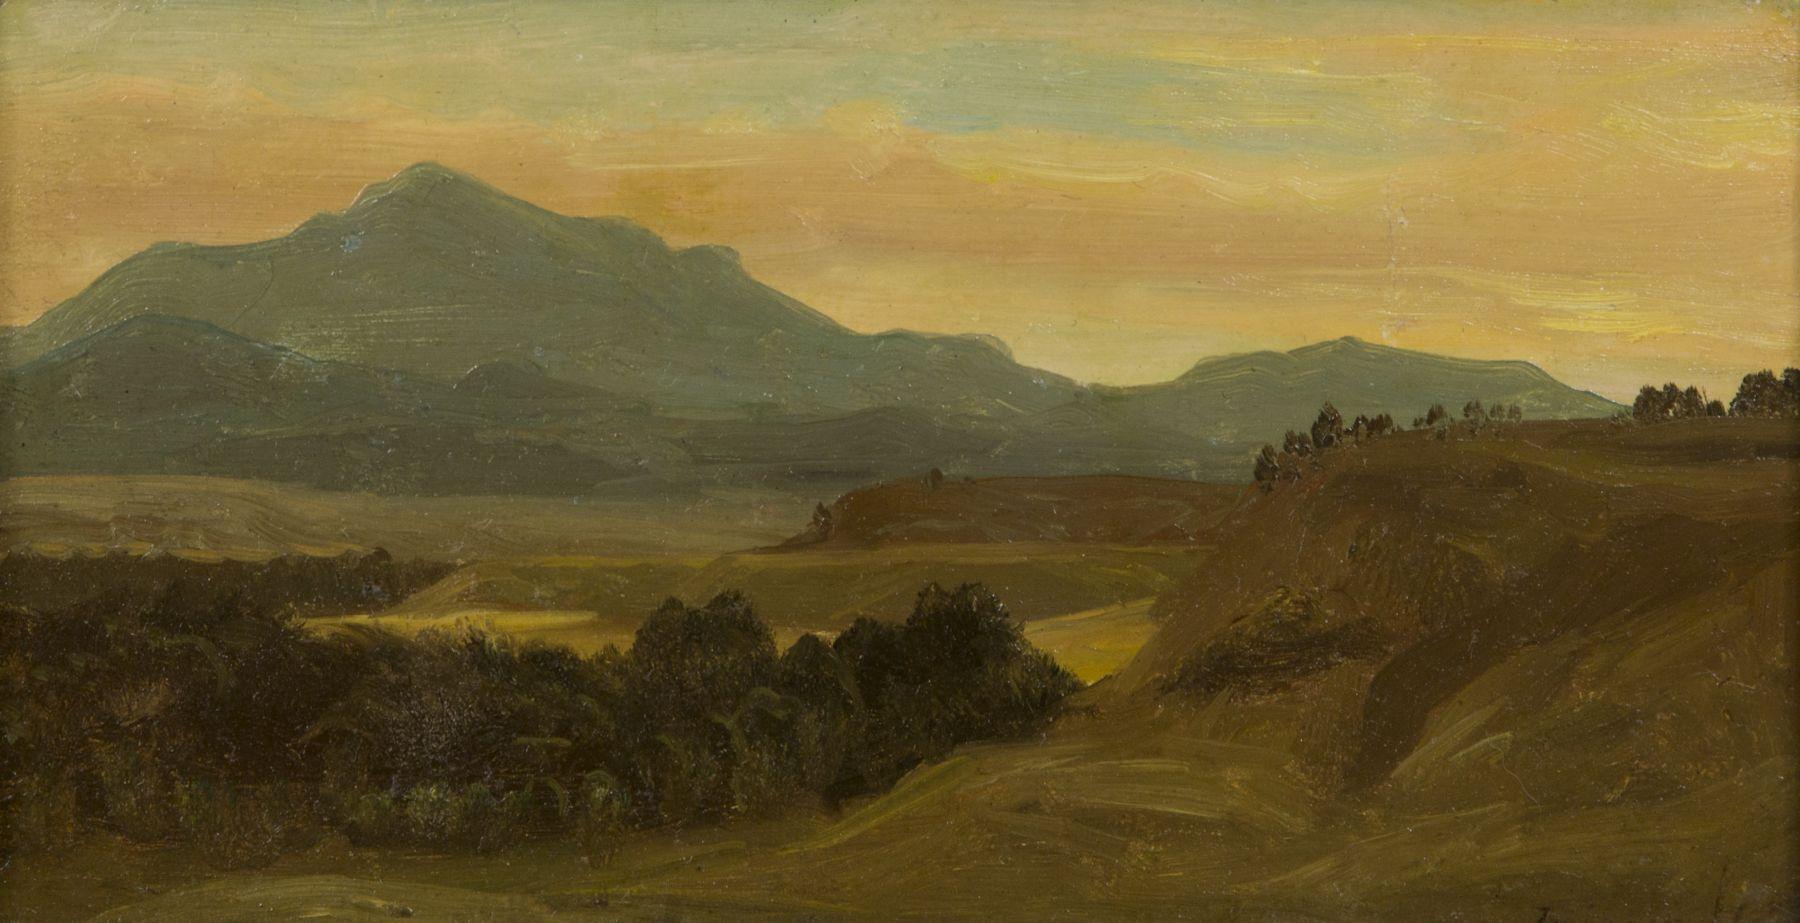 Bierstadt, Albert, Western landscape